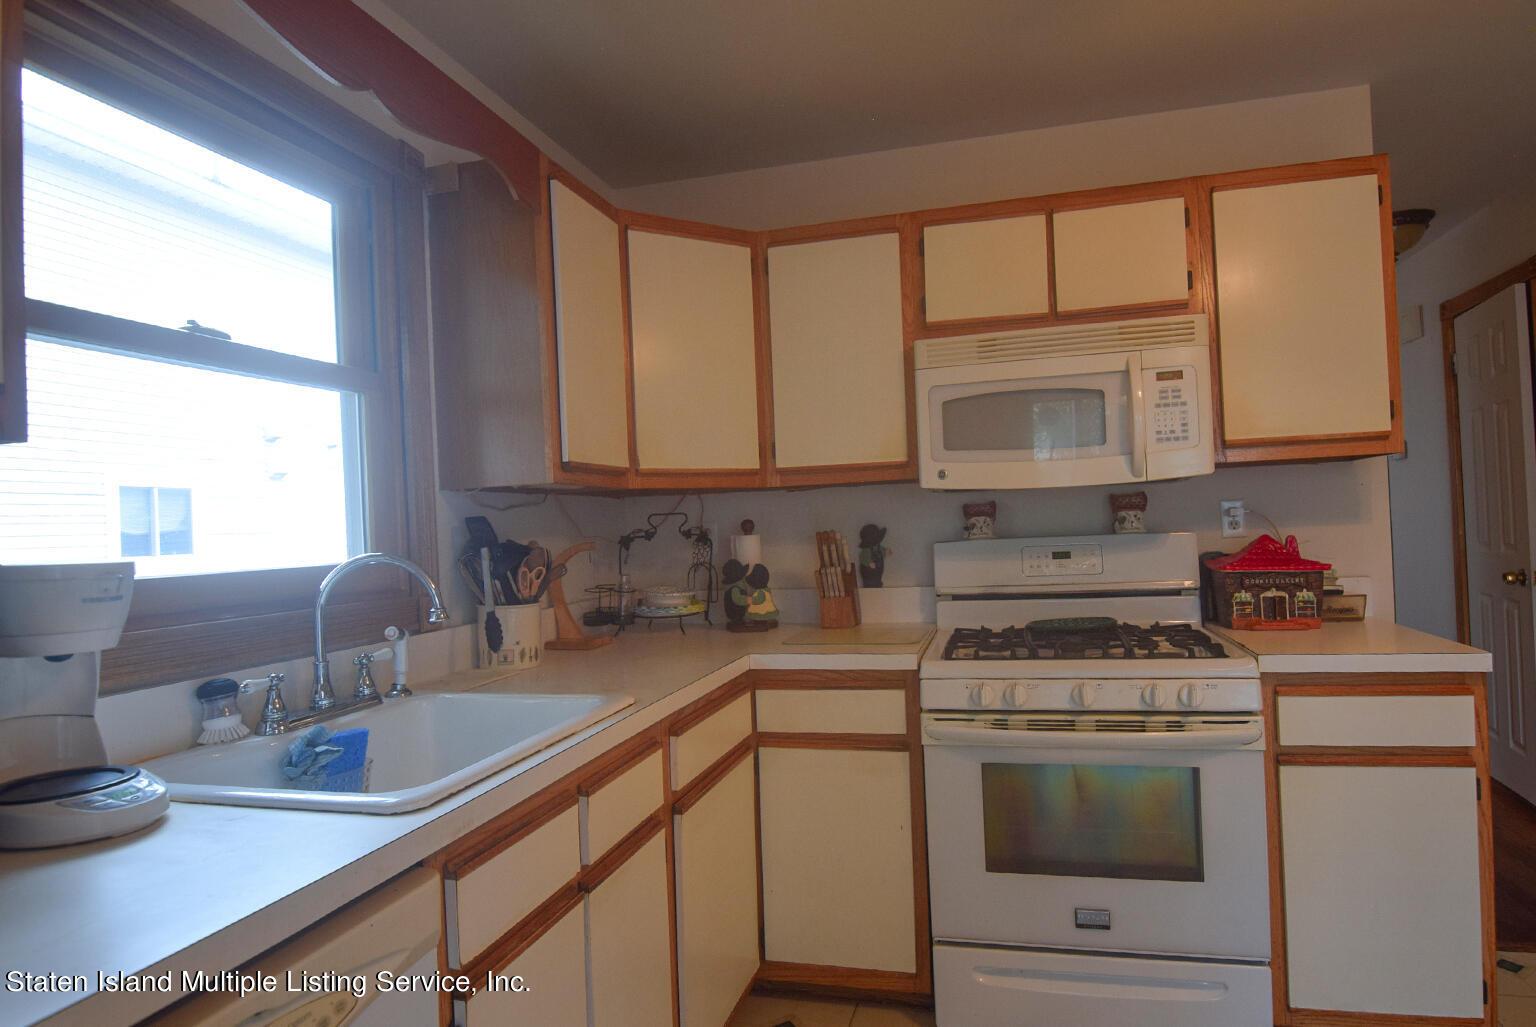 Single Family - Semi-Attached 524 Tennyson Drive  Staten Island, NY 10312, MLS-1149452-7